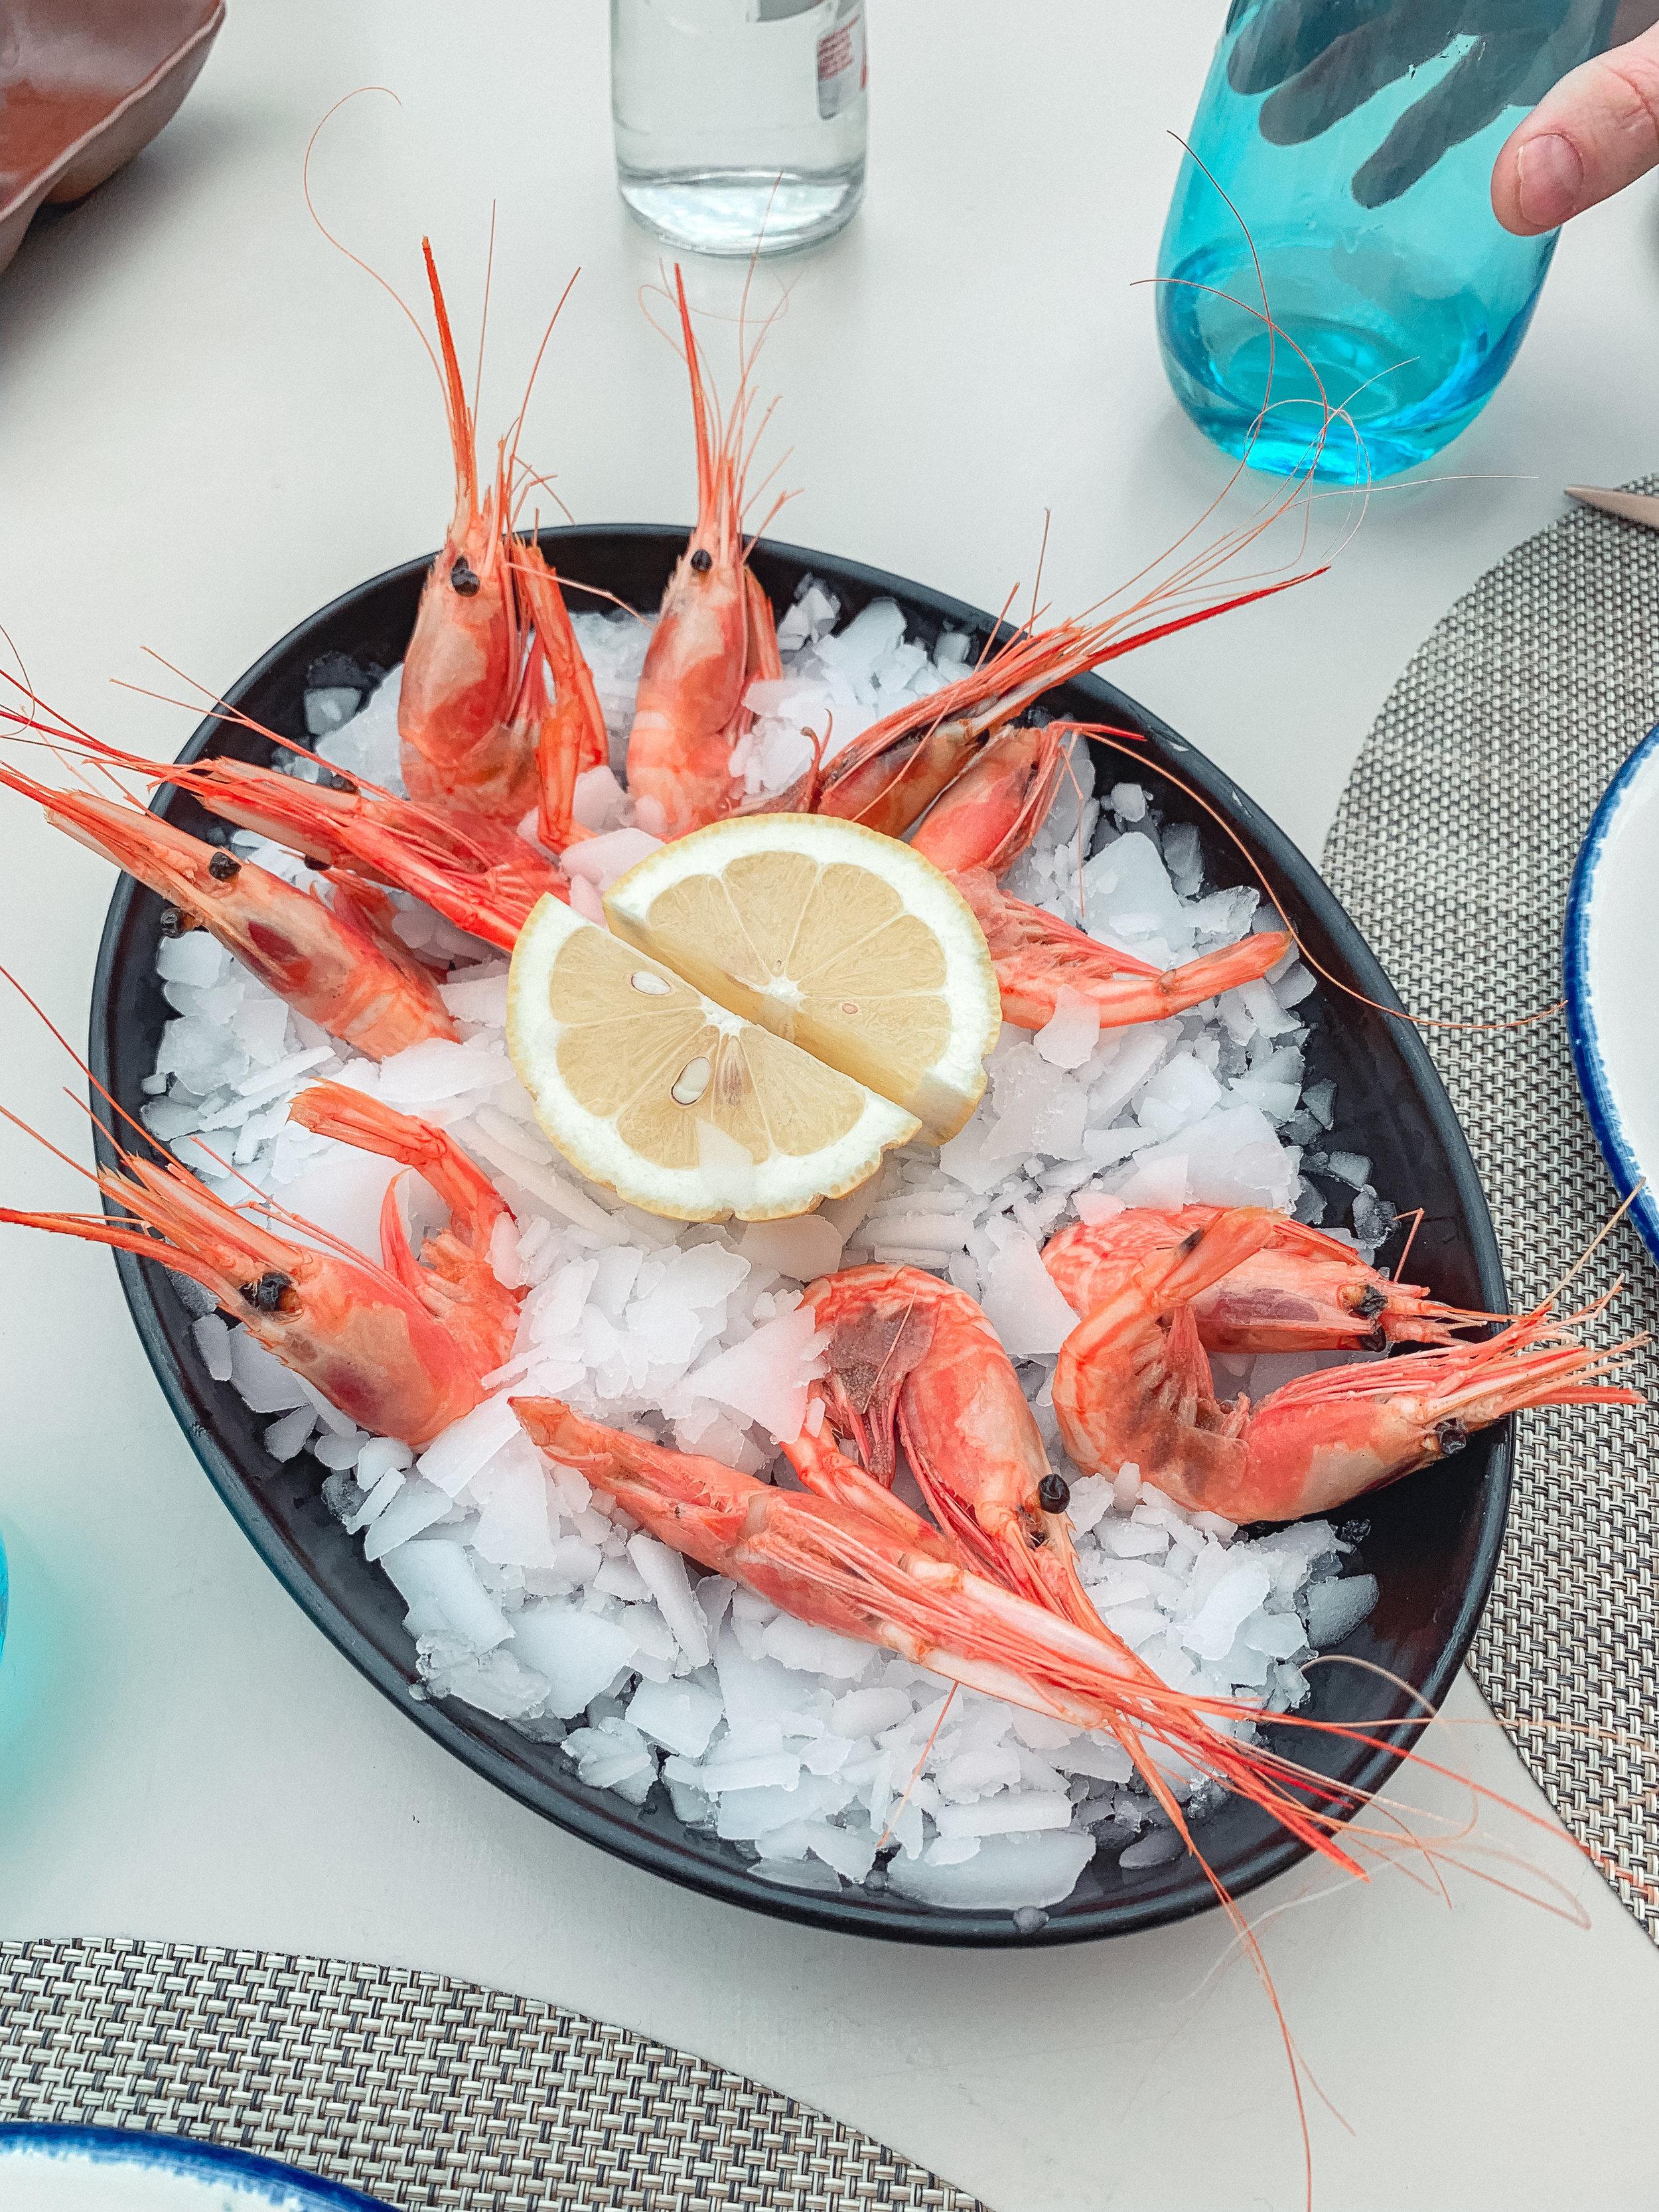 Our appetizer- baby shrimp